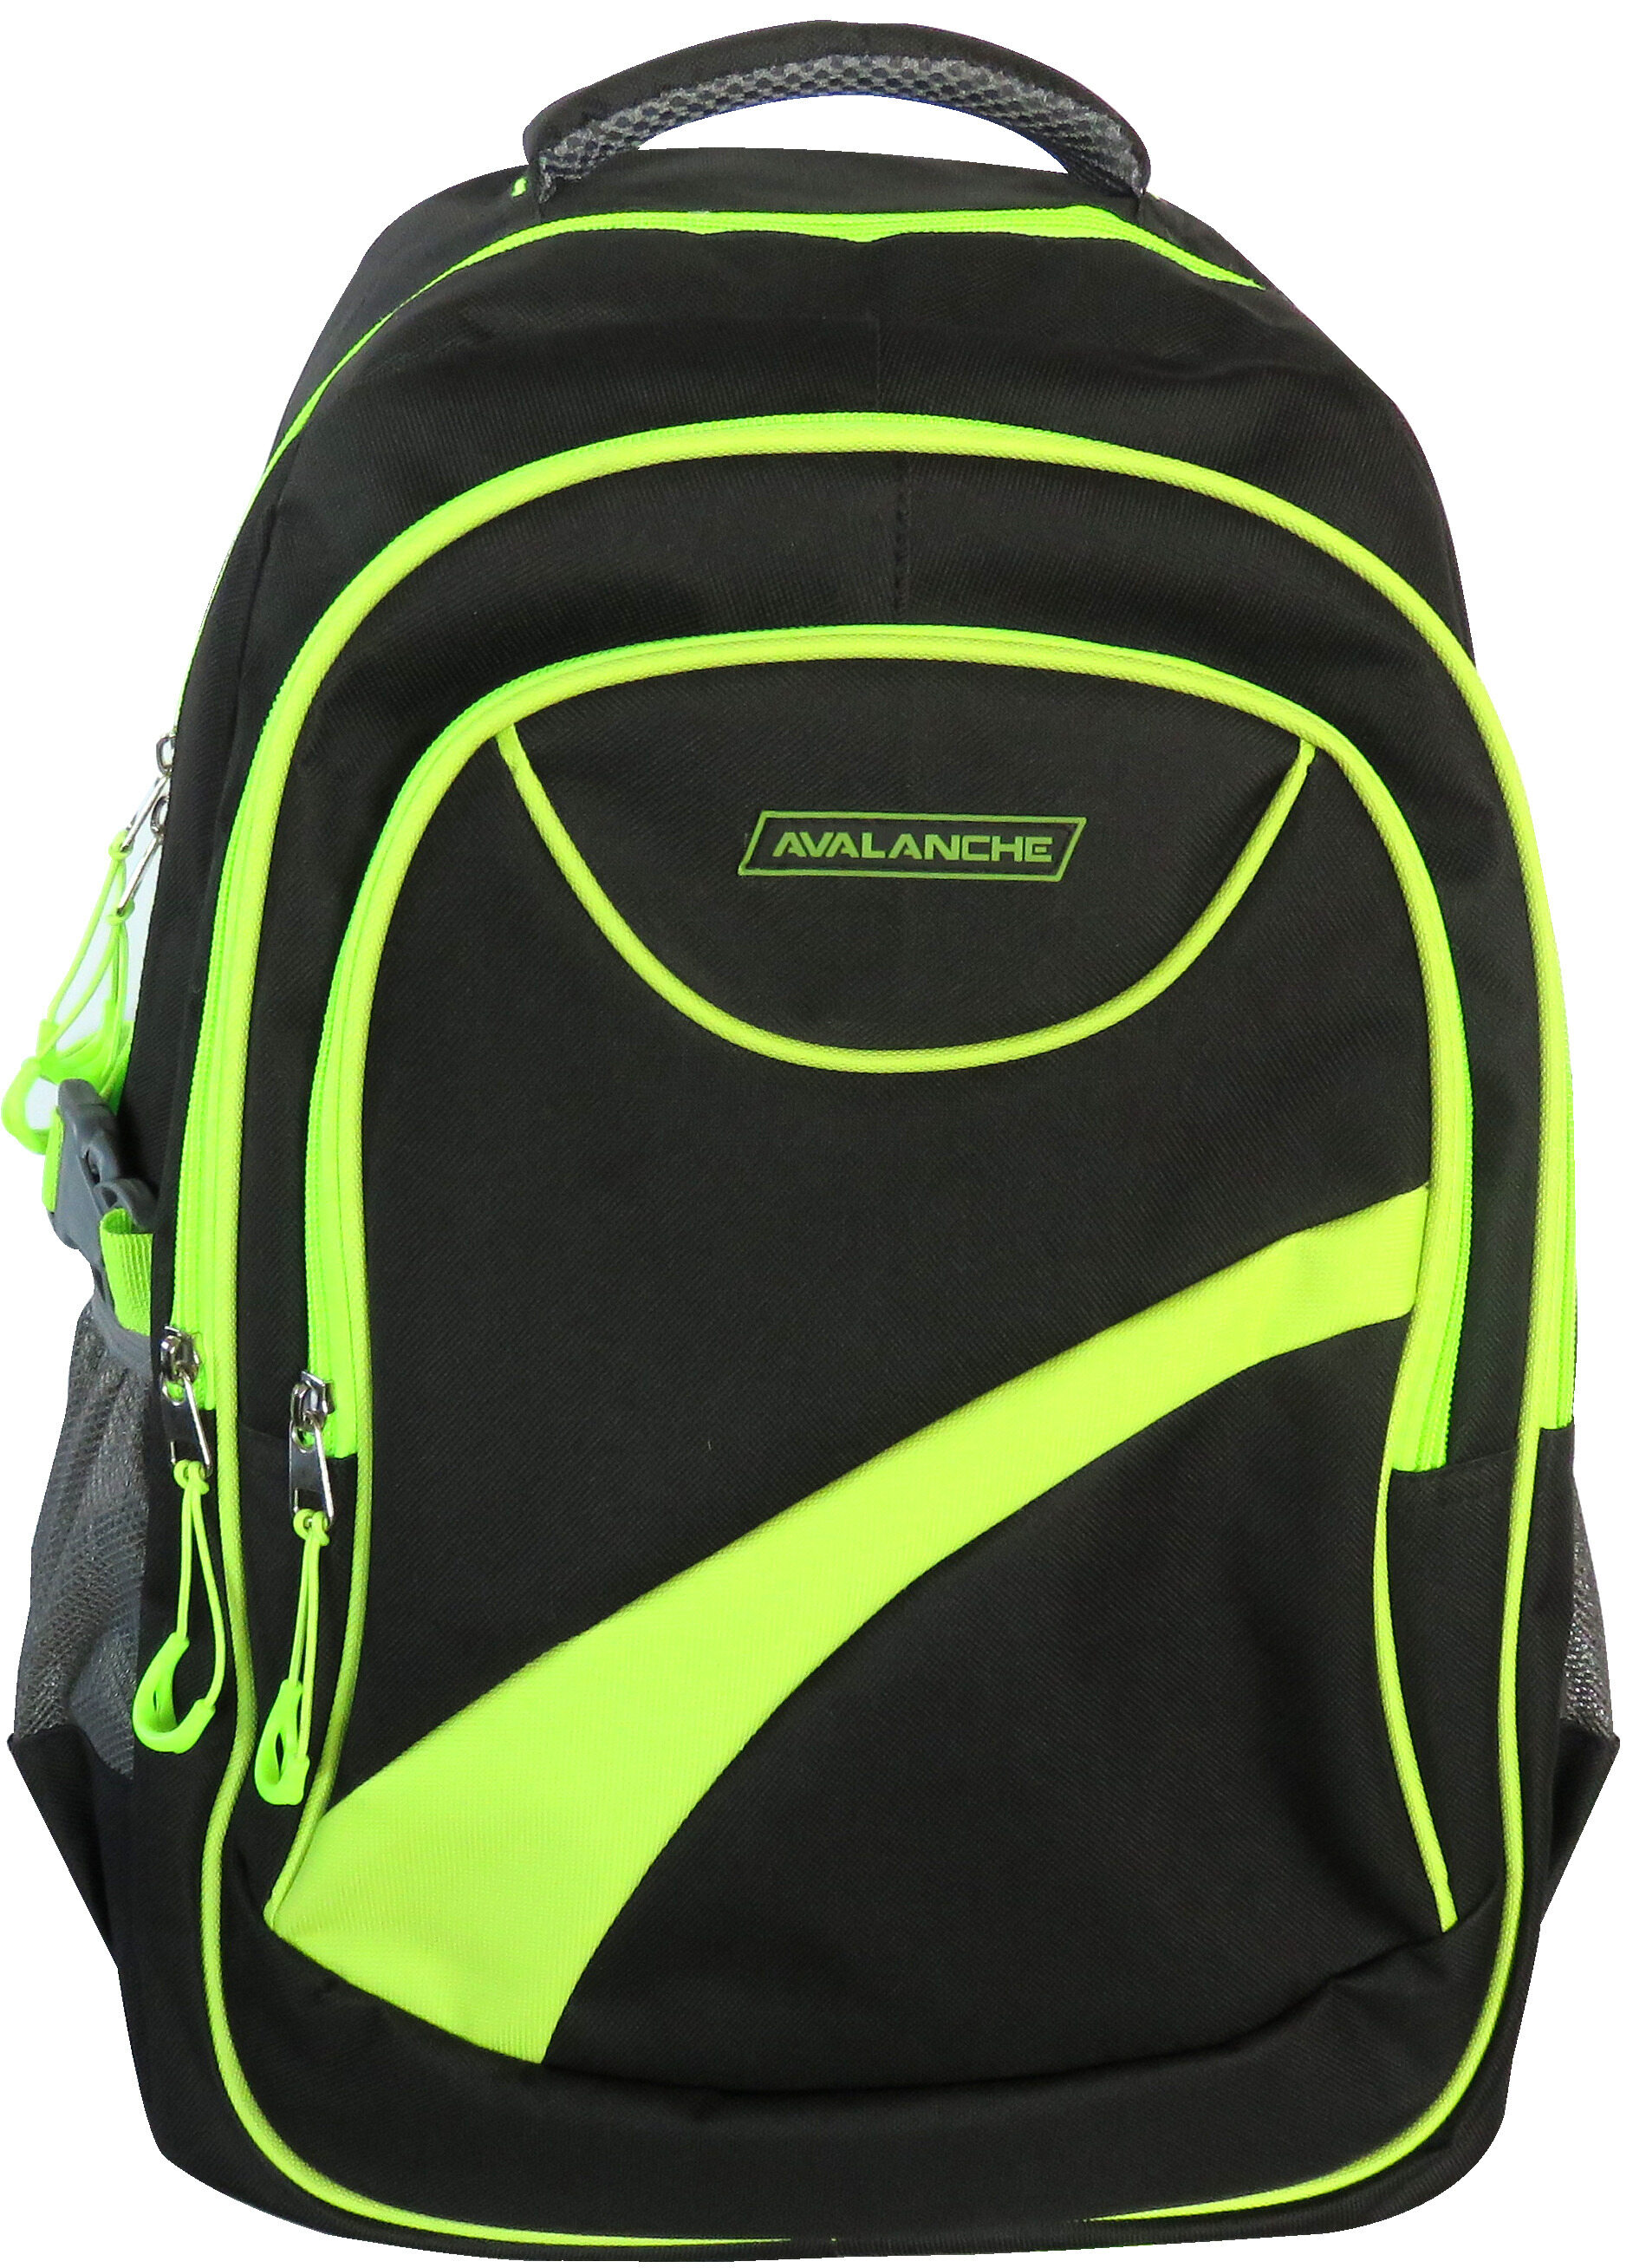 Avalanche Standard Student Backpack - Black-Lime